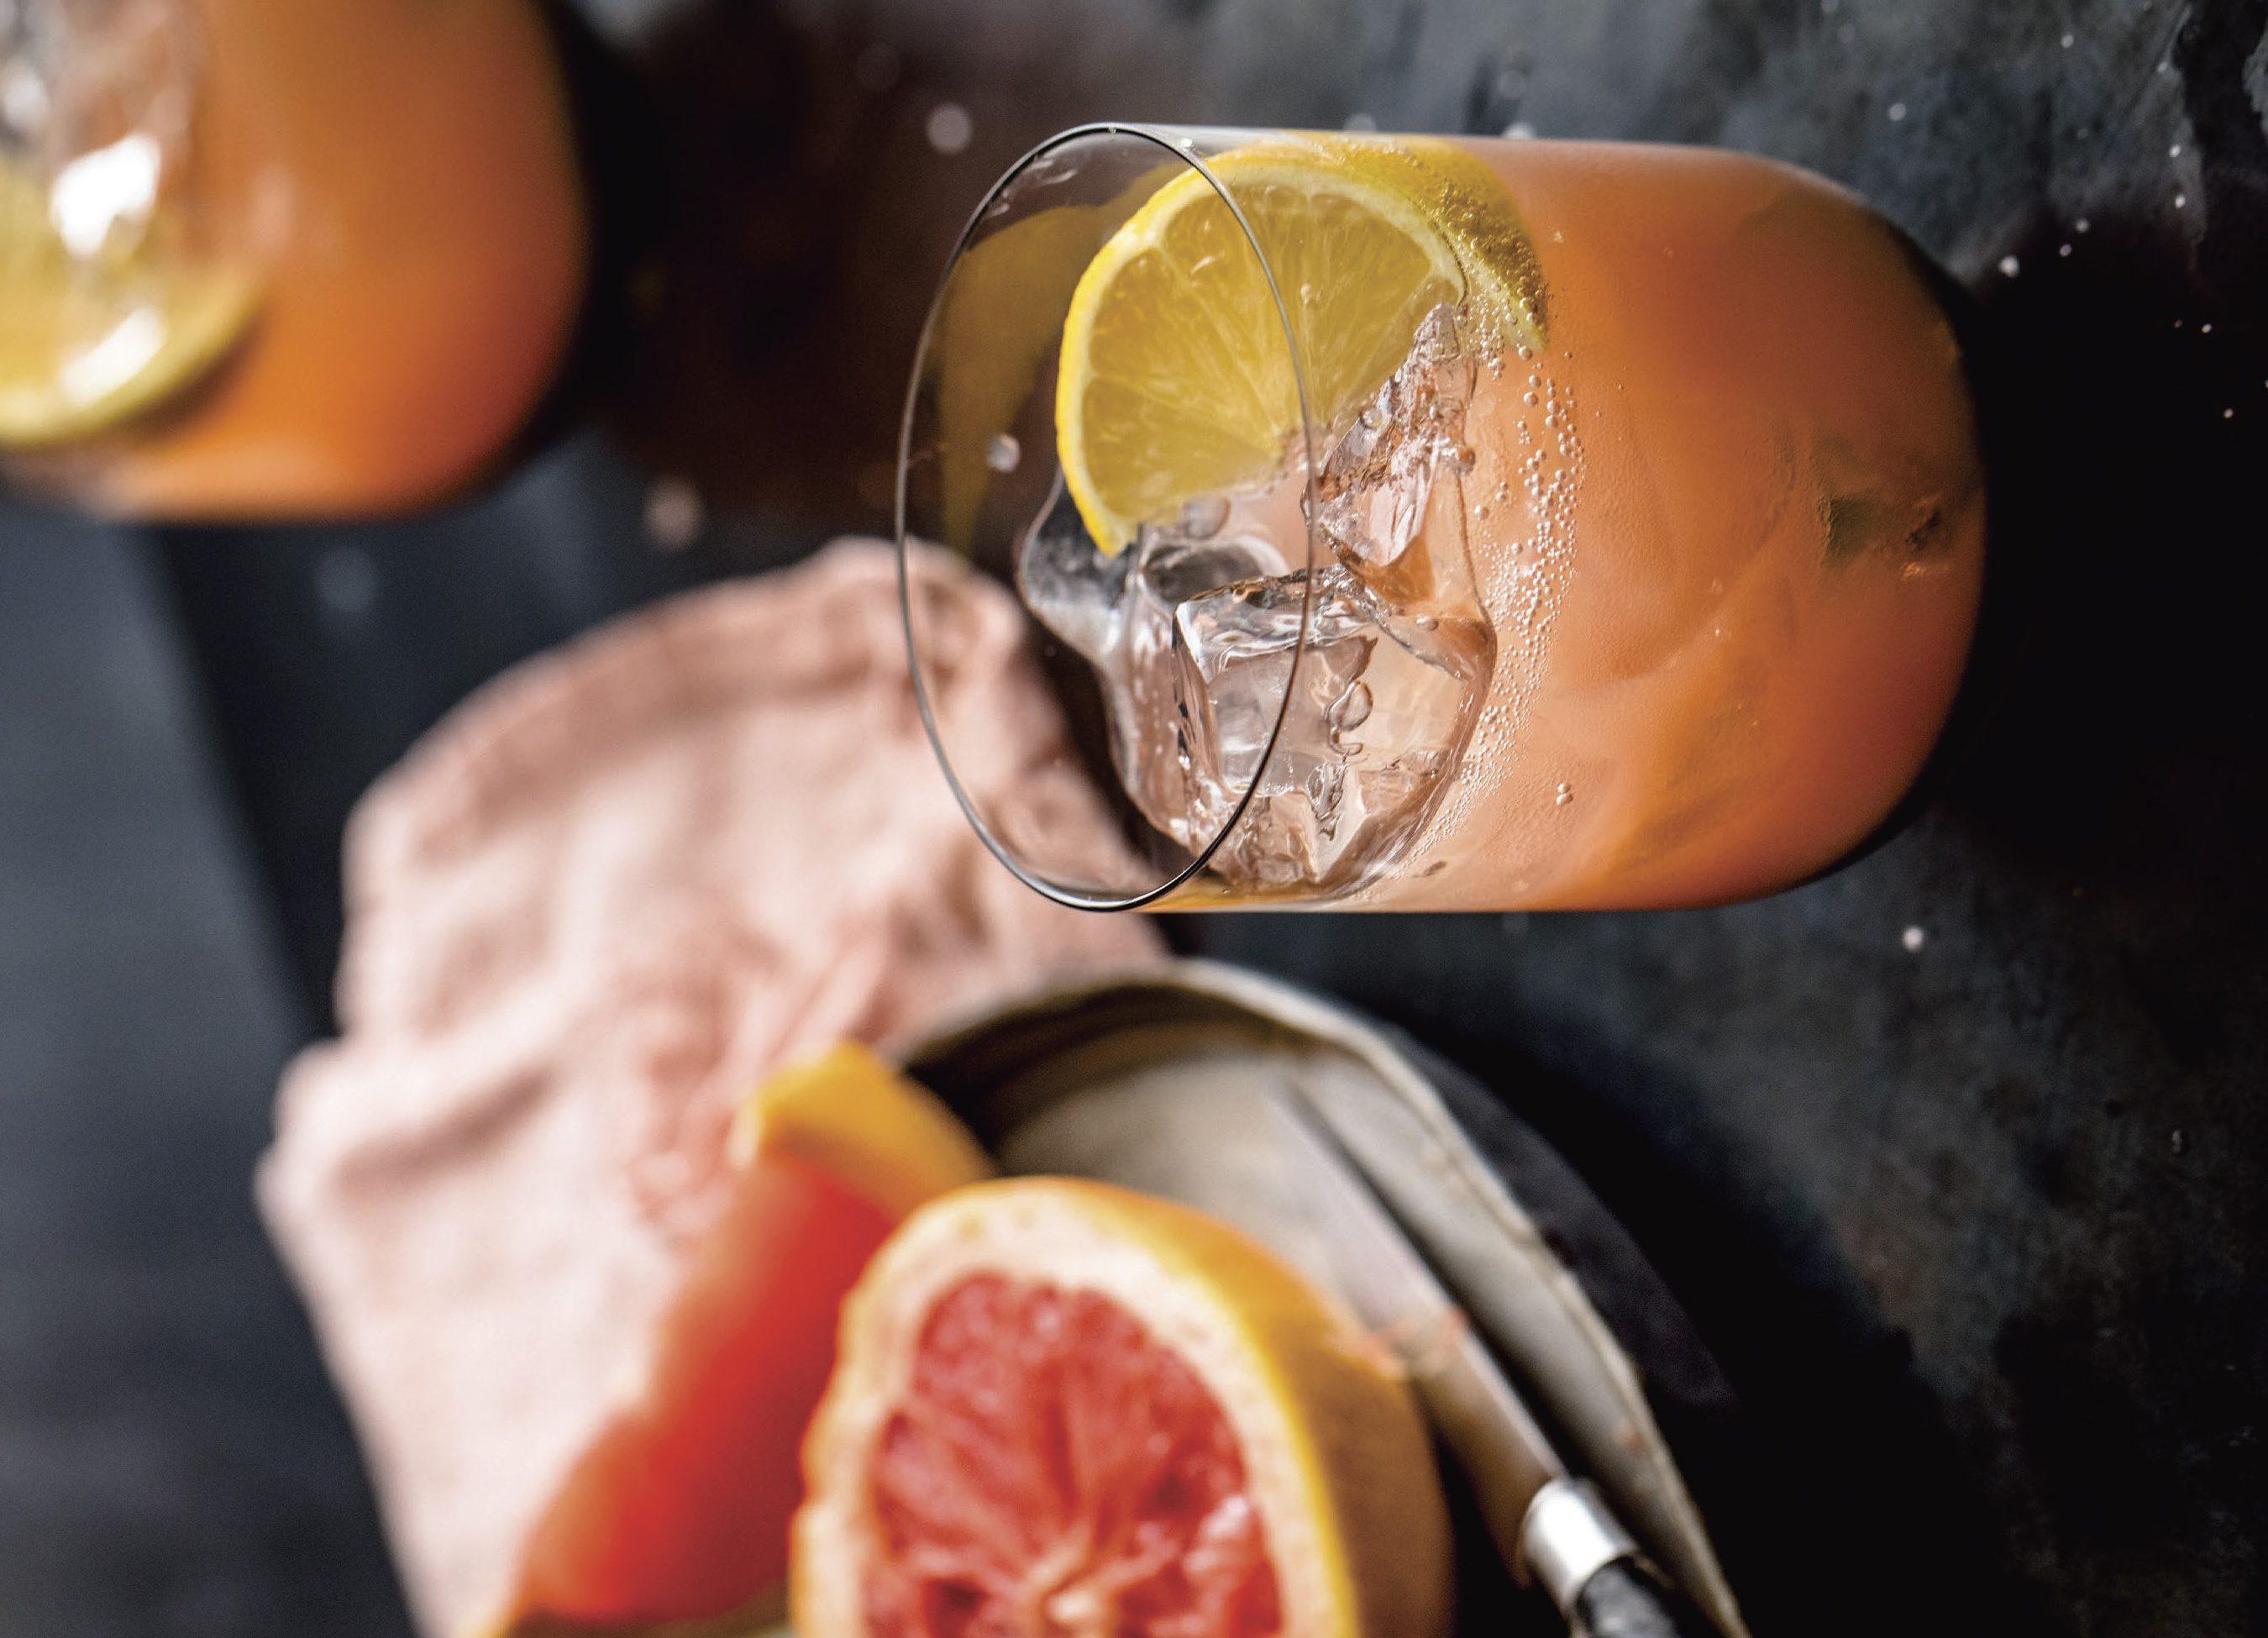 The Blaylock (Honey, Grapefruit, Lemon, and Seltzer)